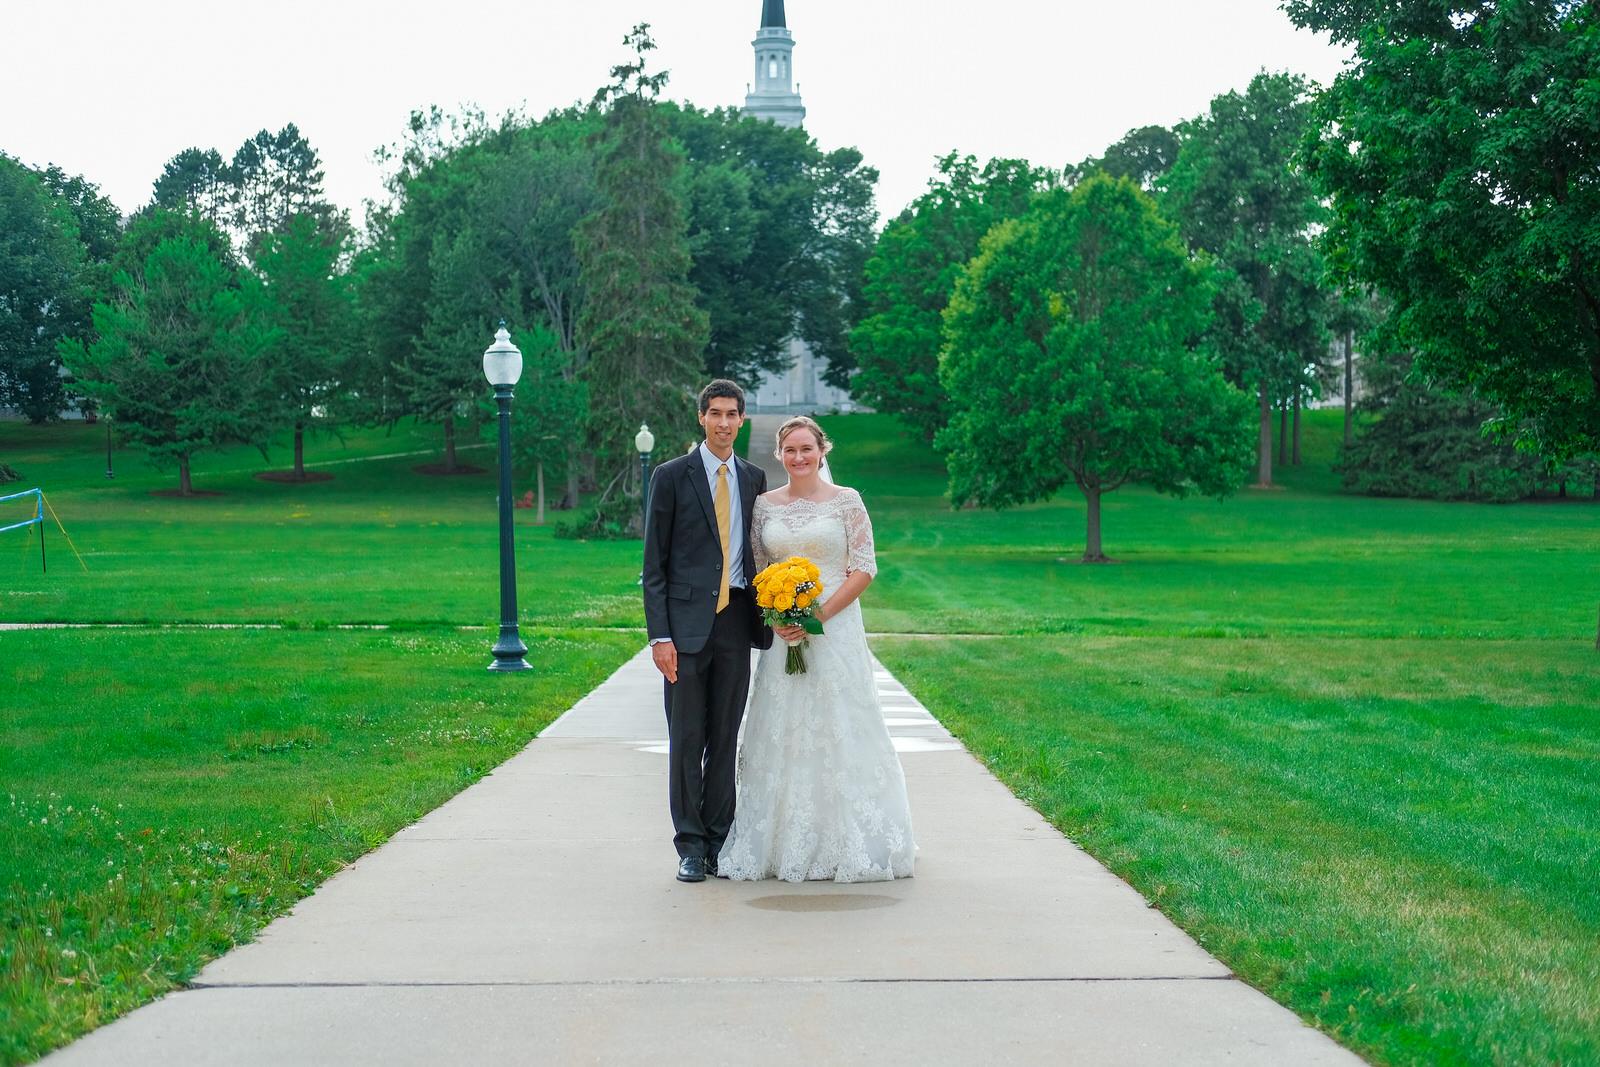 candid-vermont-wedding-photography-1023.jpg